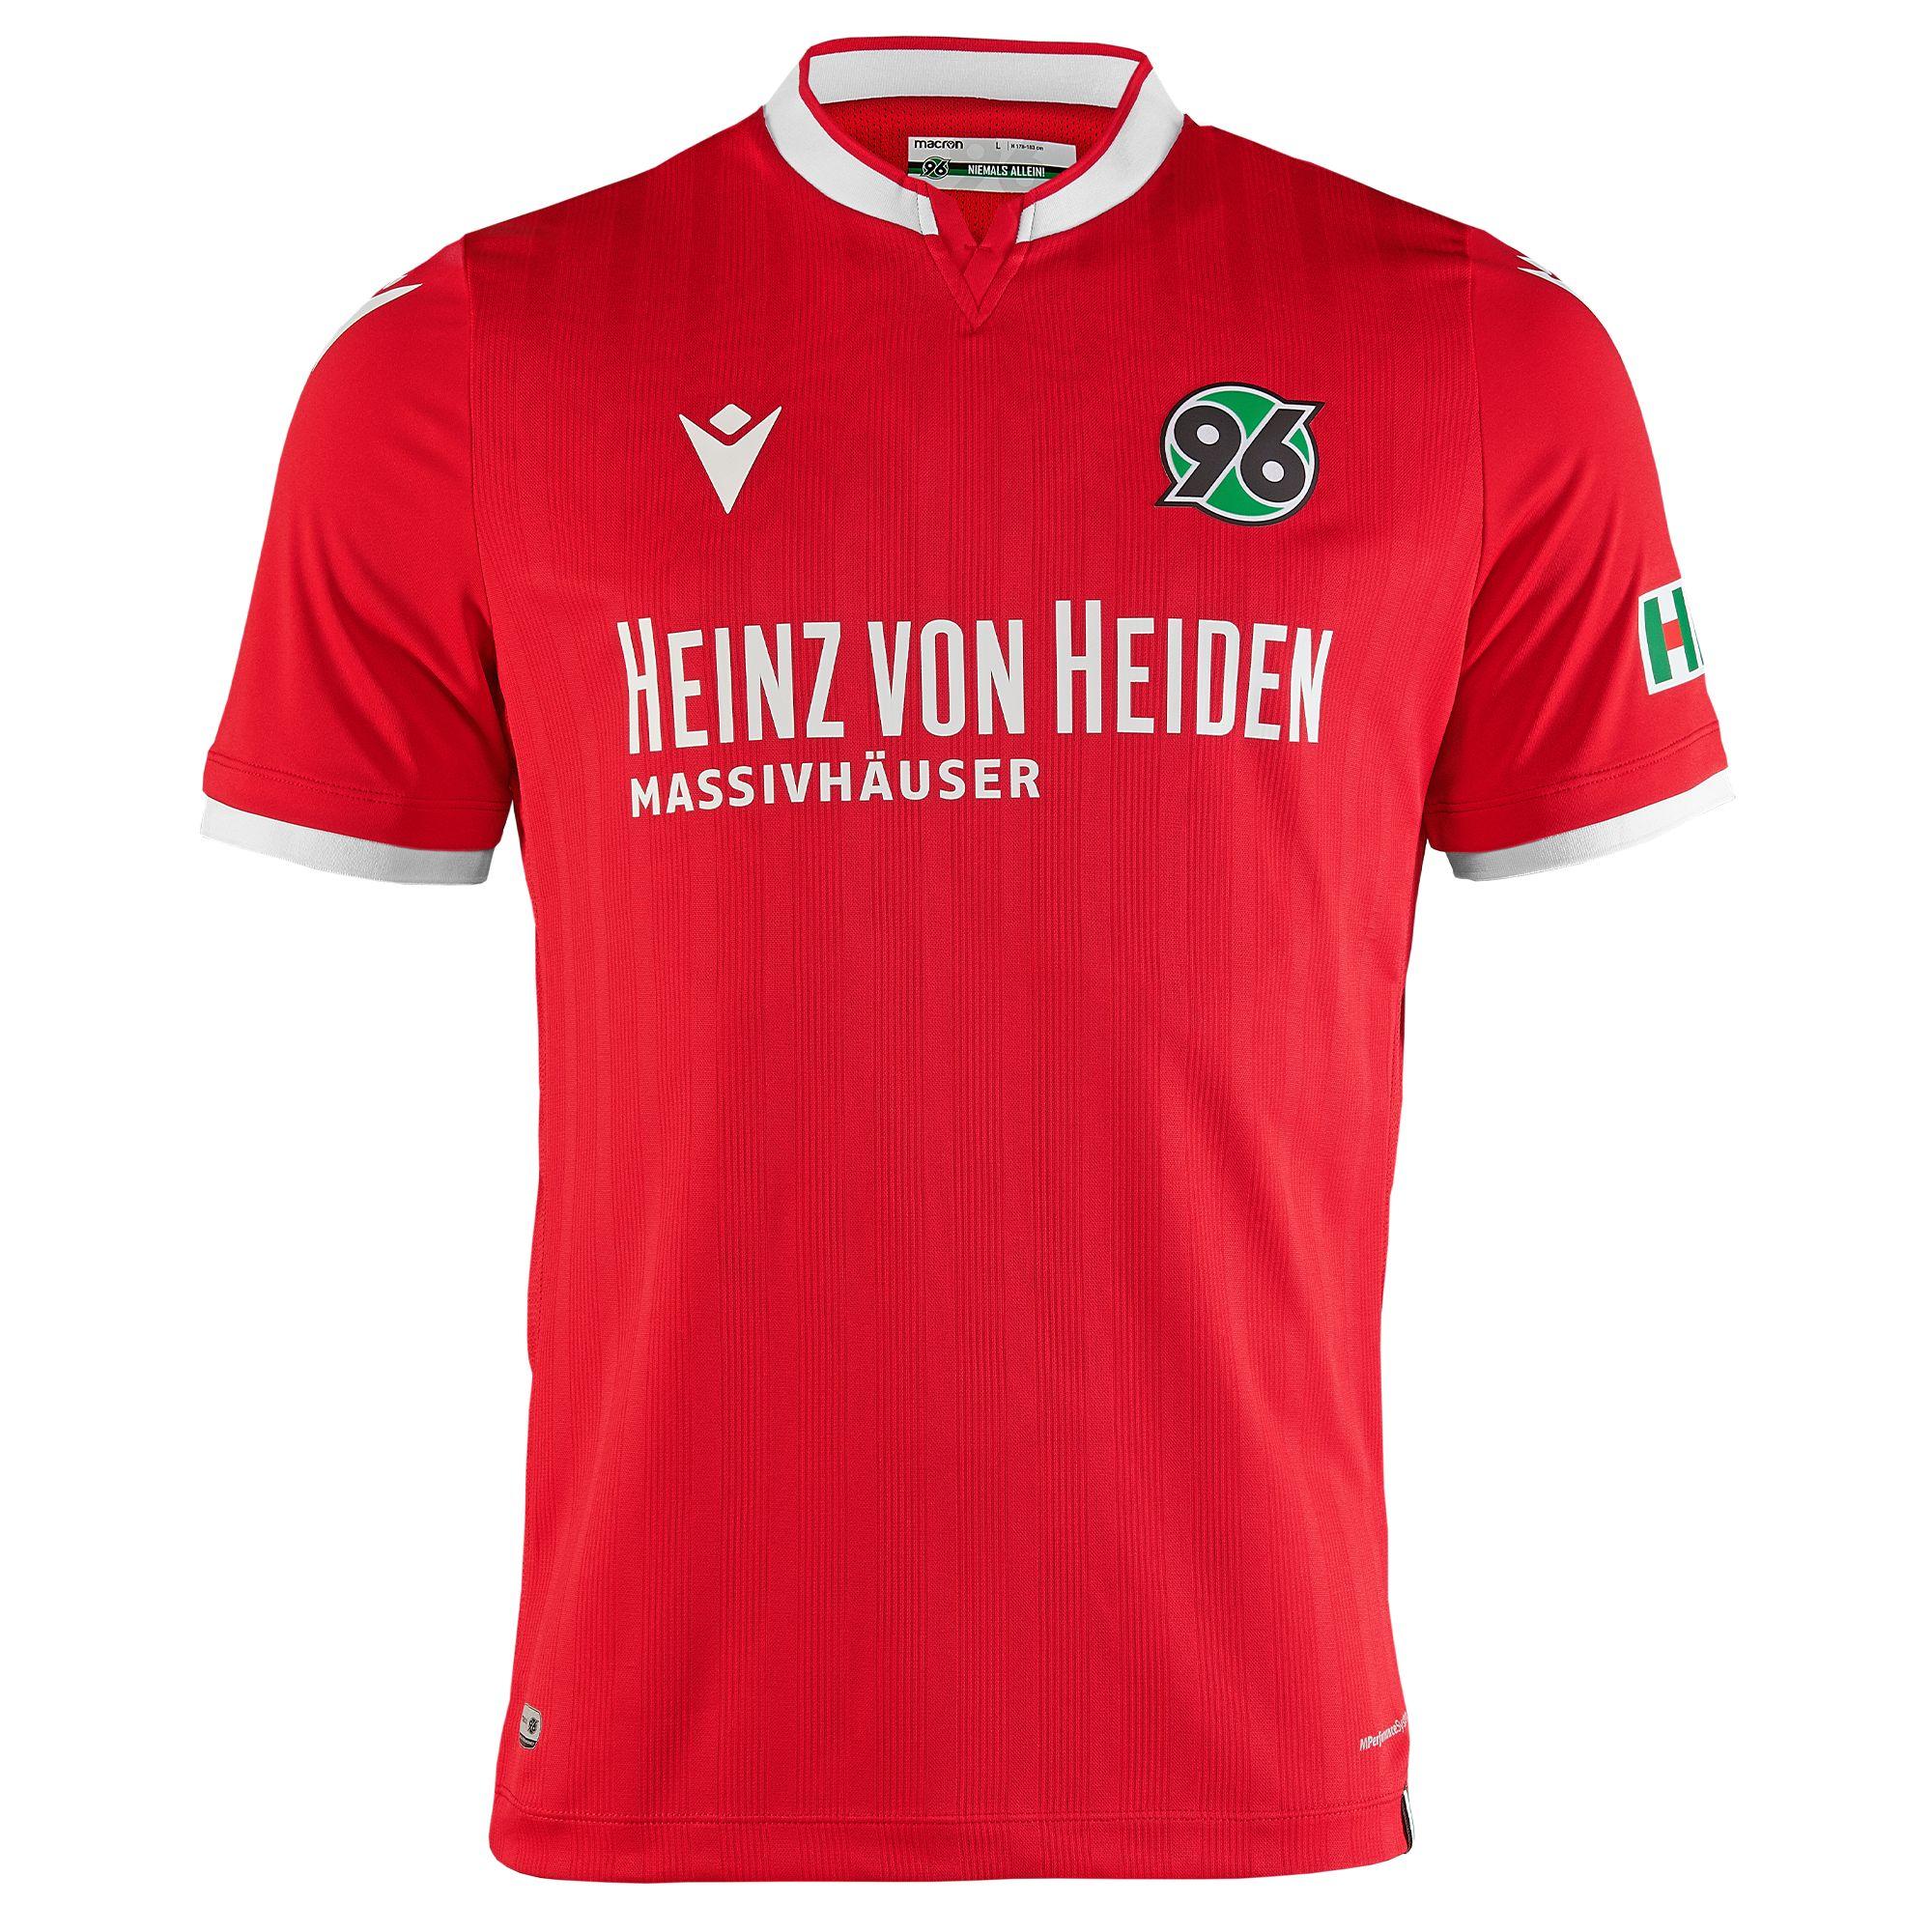 Hannover 96 2020-21 Macron Home Kit | 20/21 Kits ...